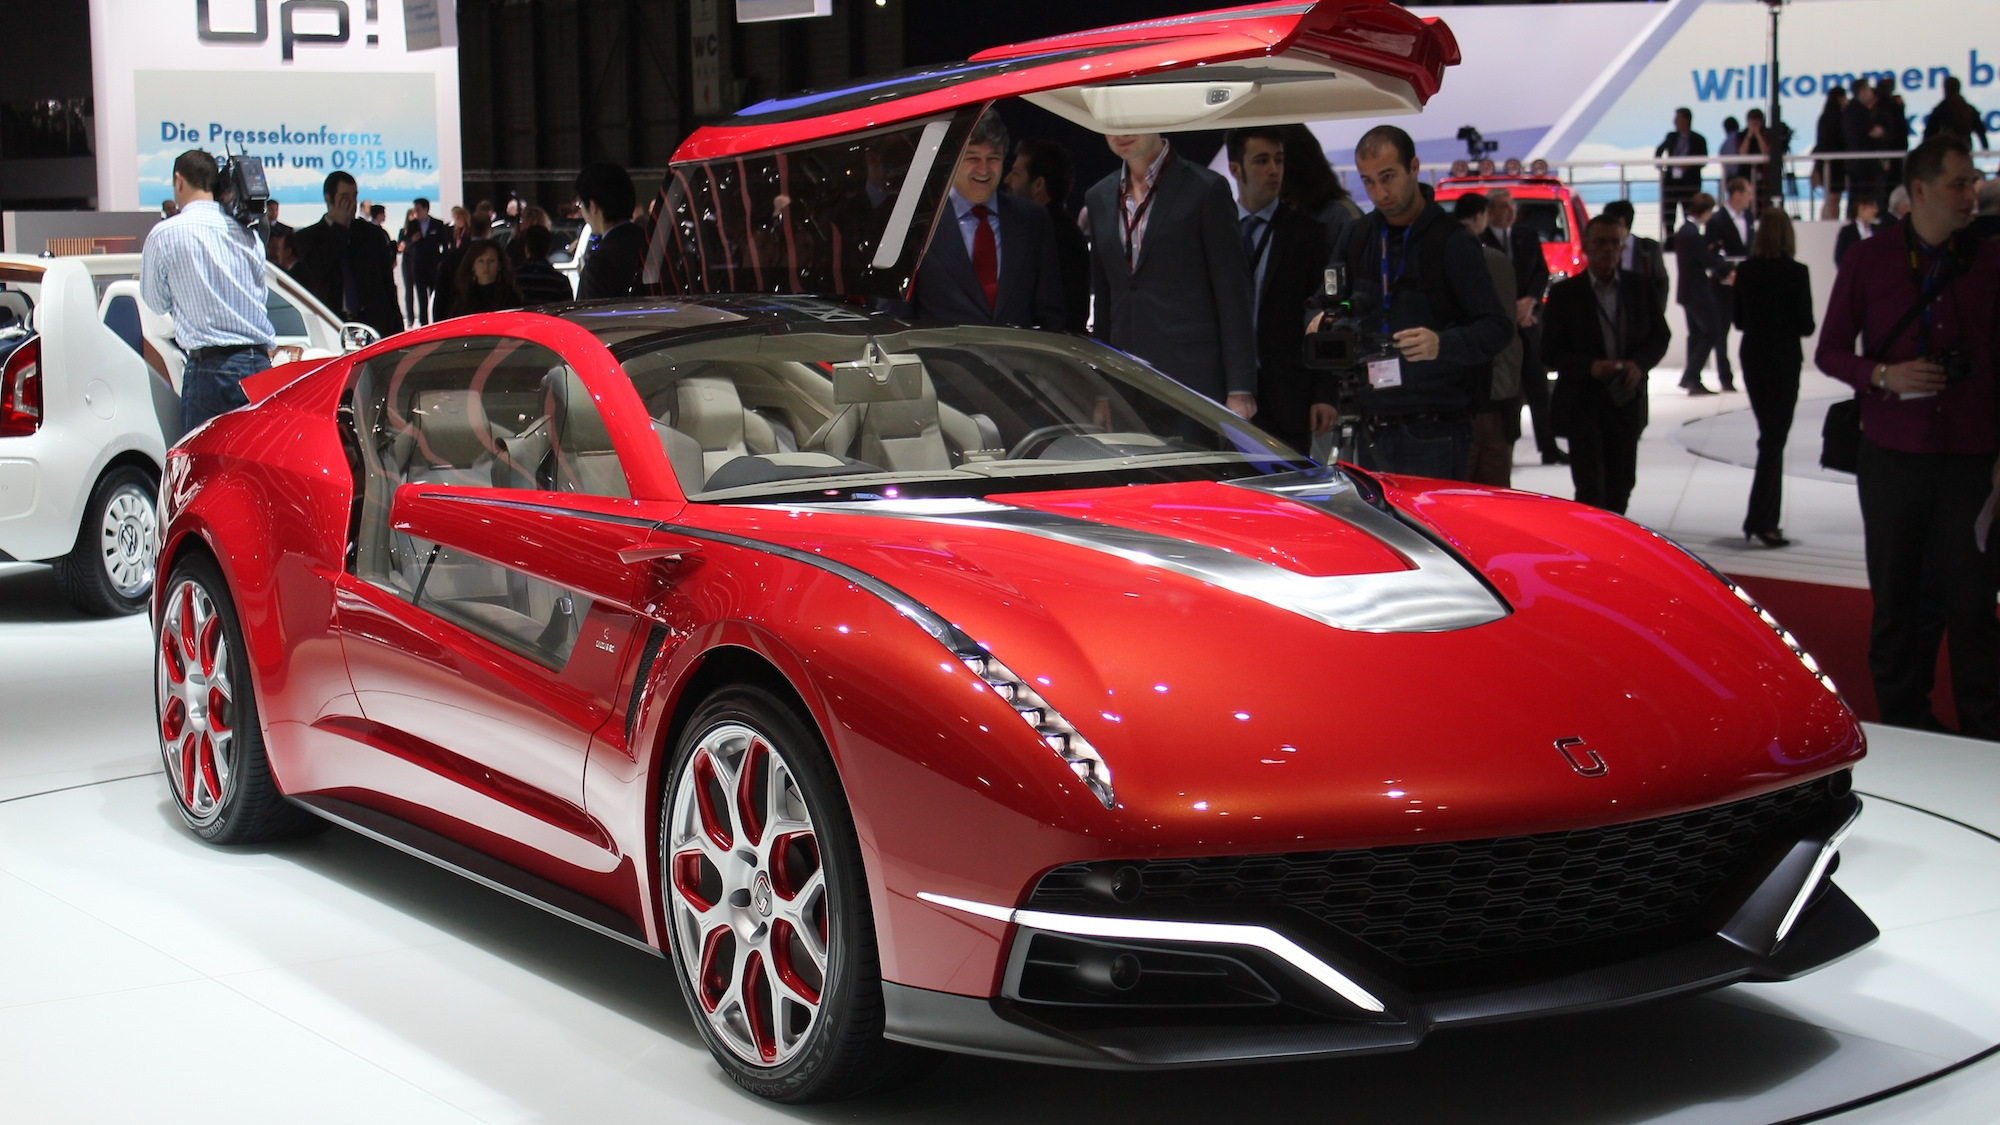 Italdesign Giugiaro Brivido live photos, 2012 Geneva Motor Show